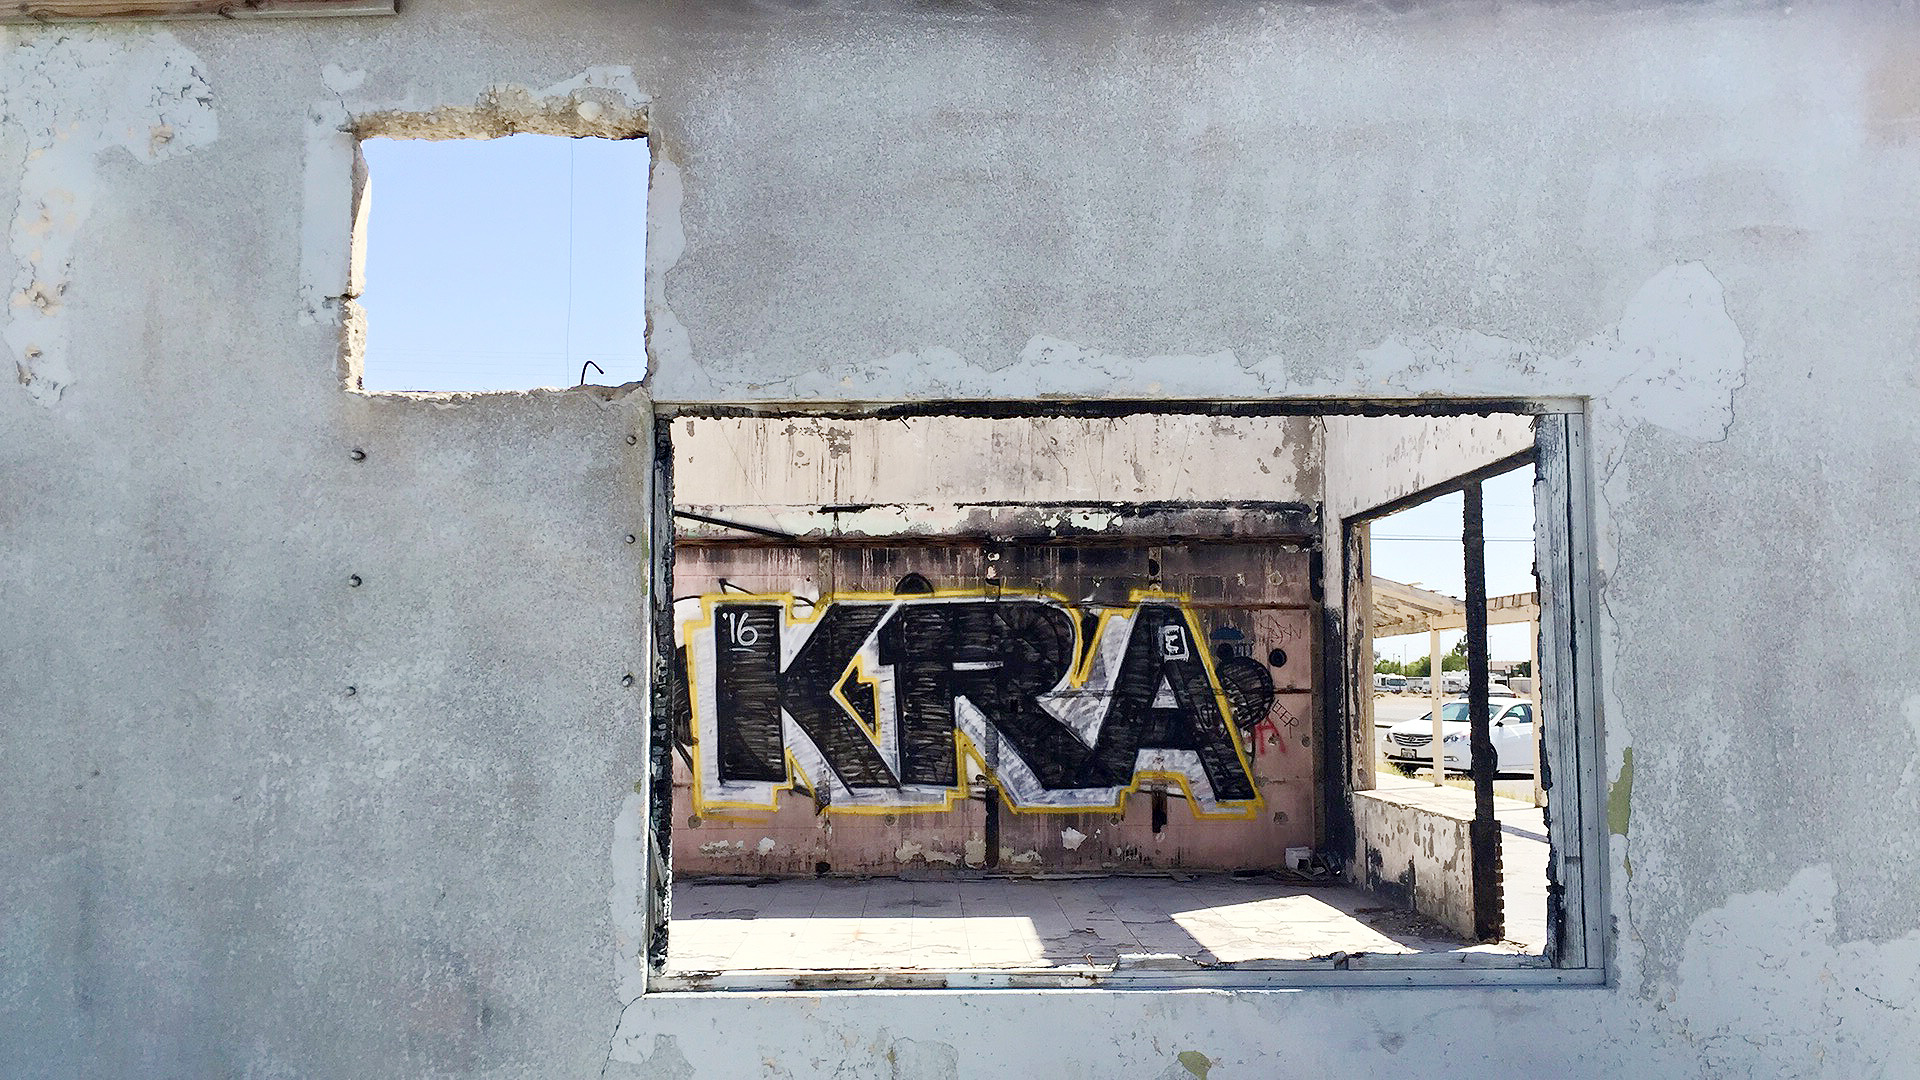 Abandoned buildings in Niland, CA